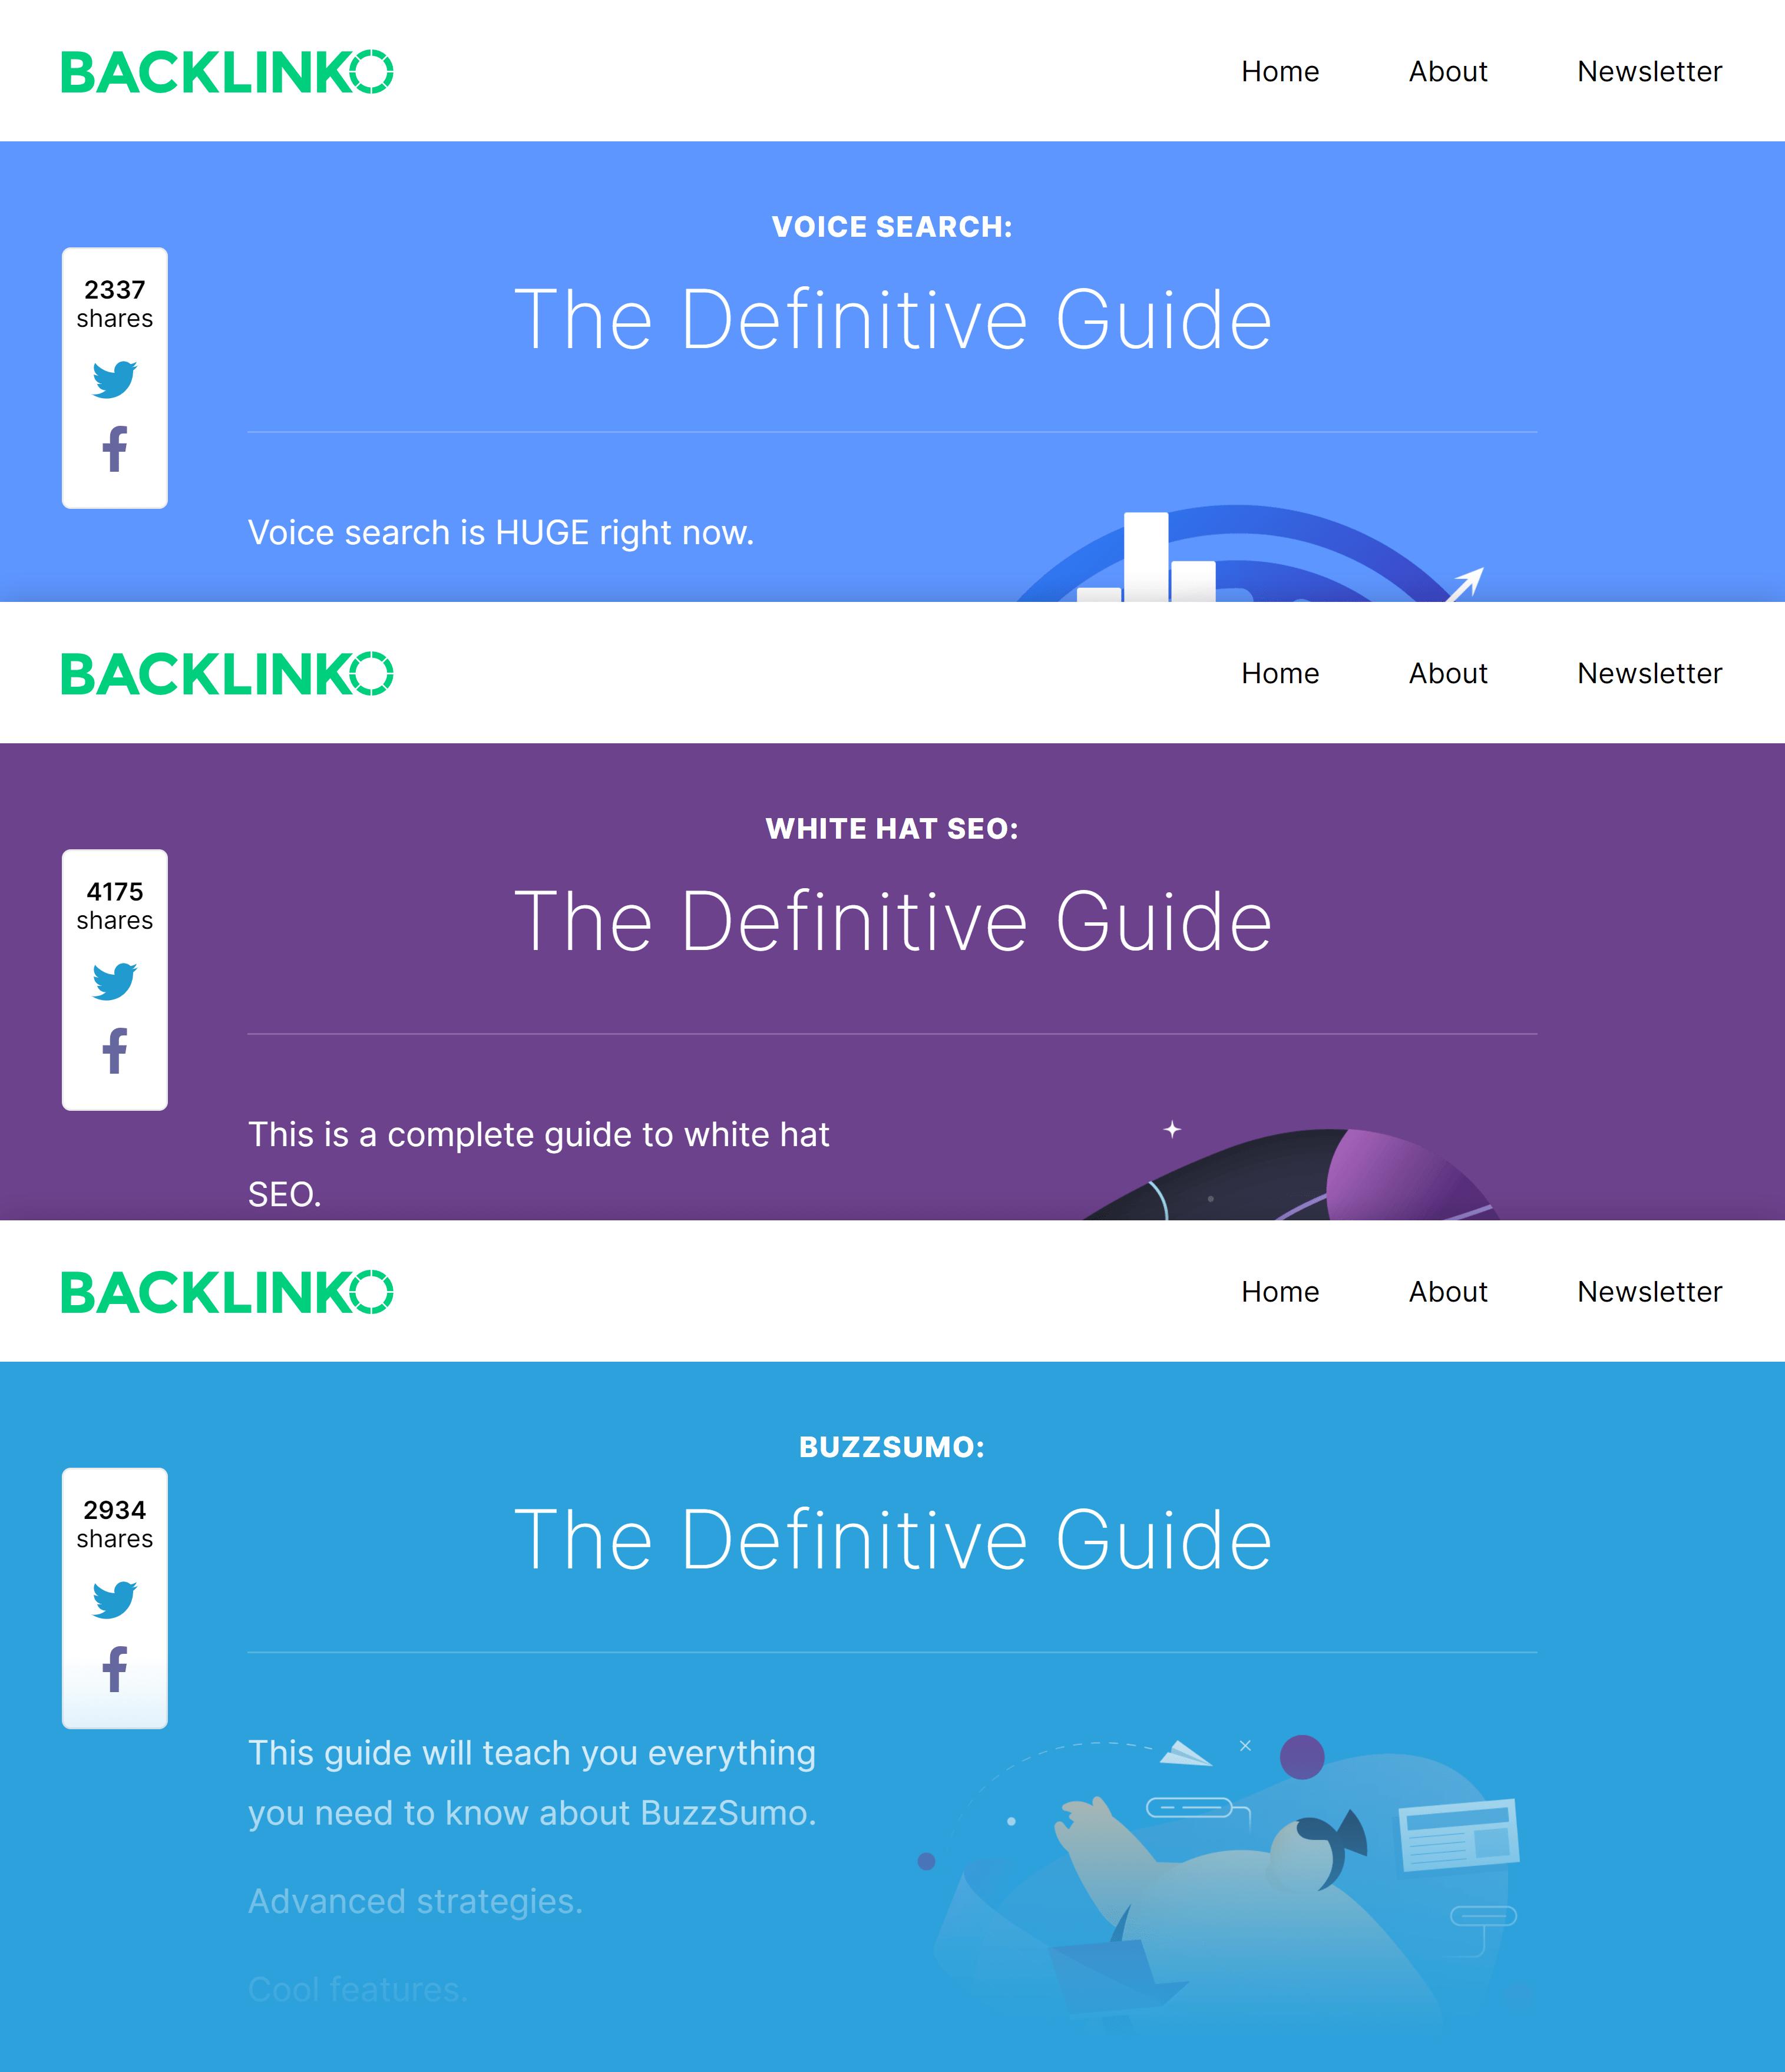 Backlinko custom designed guides